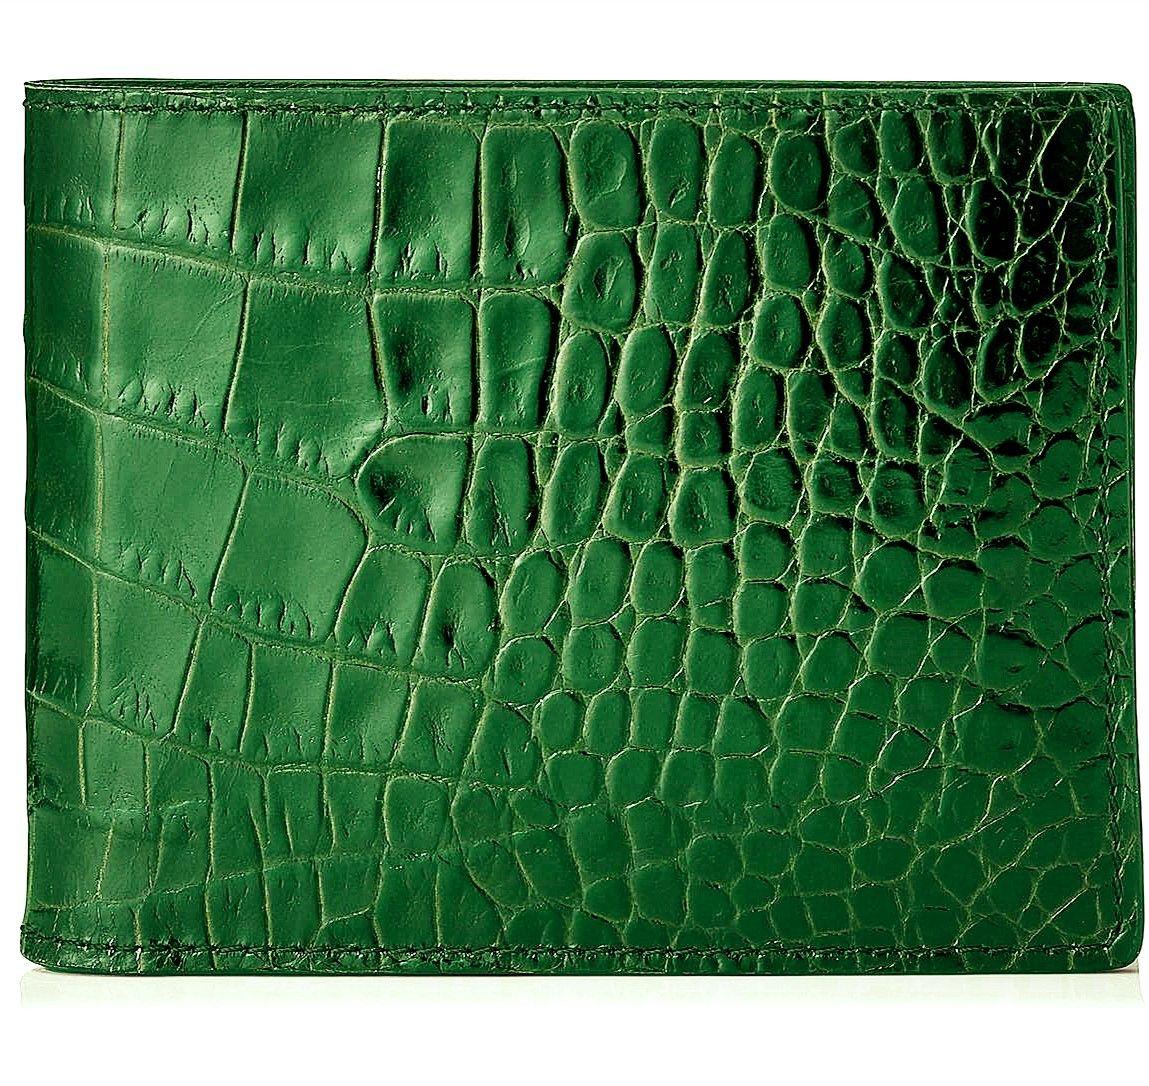 Gift for him leather wallet men, Premium Genuine Crocodile Alligator Leather Skin Bifold Wallet for Men,Handmade Leather wallet